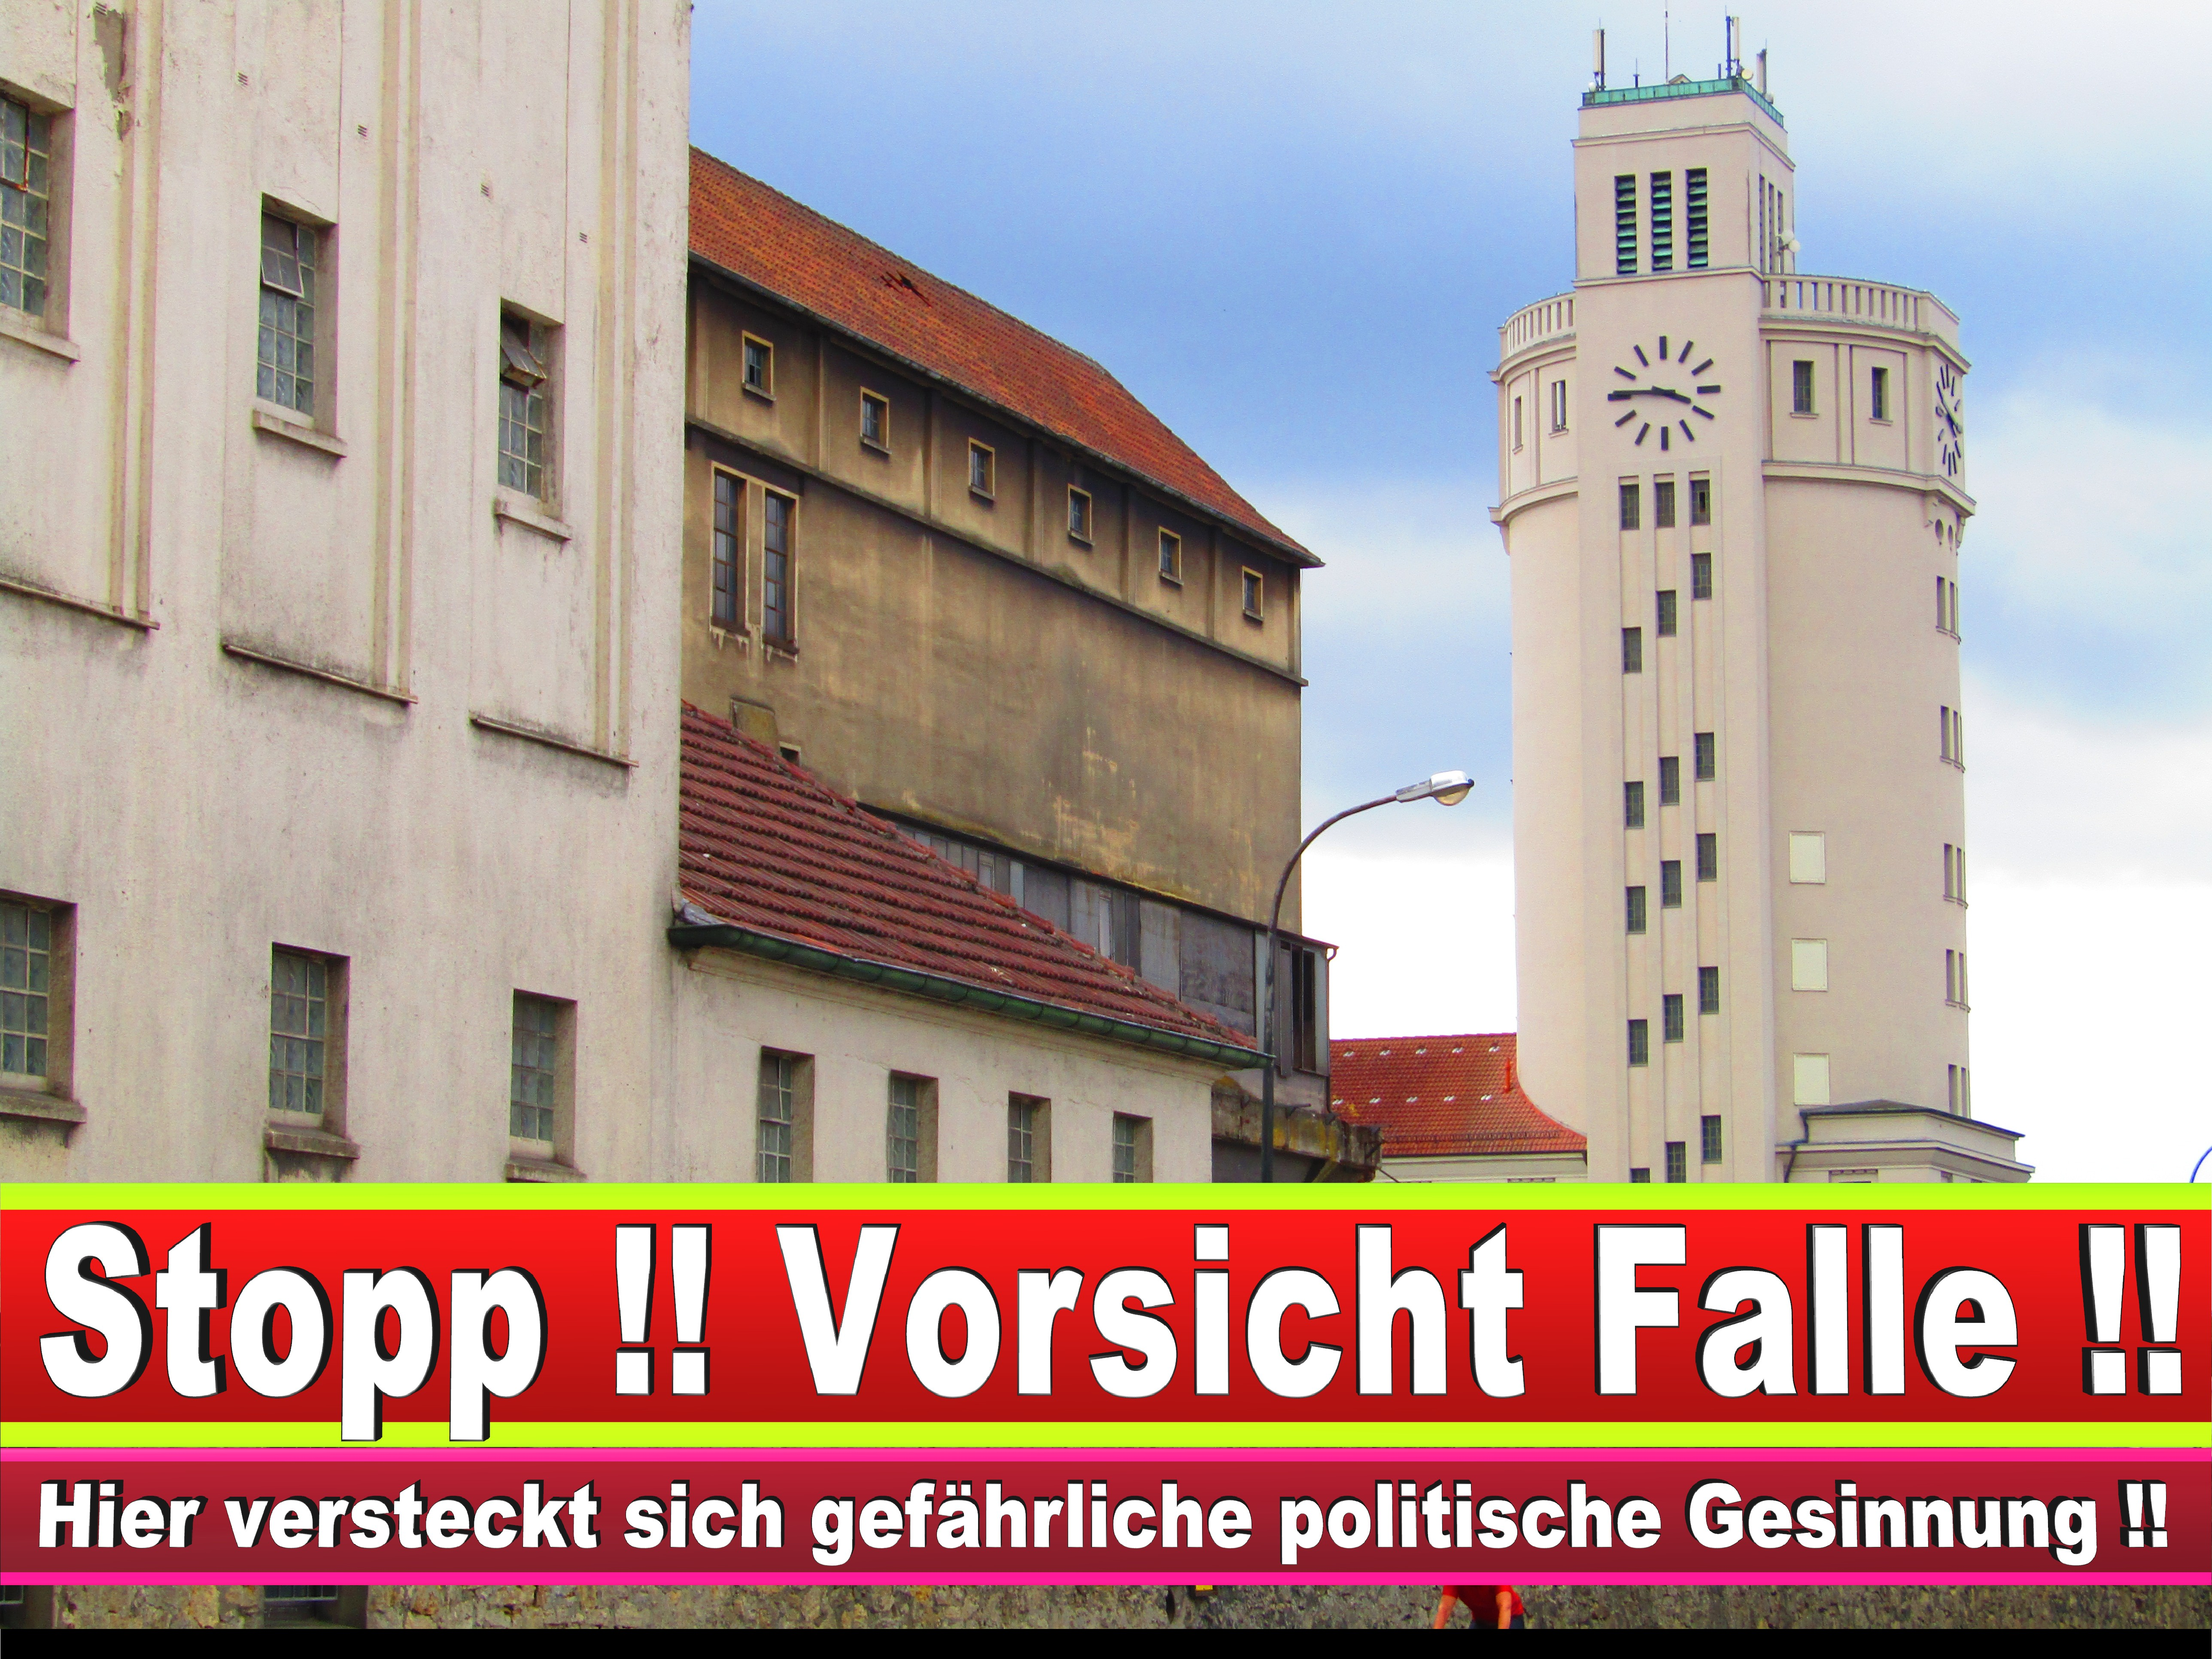 BPI SOLUTIONS GMBH & CO KG Henning Kortkamp Krackser Str 12 Bielefeld